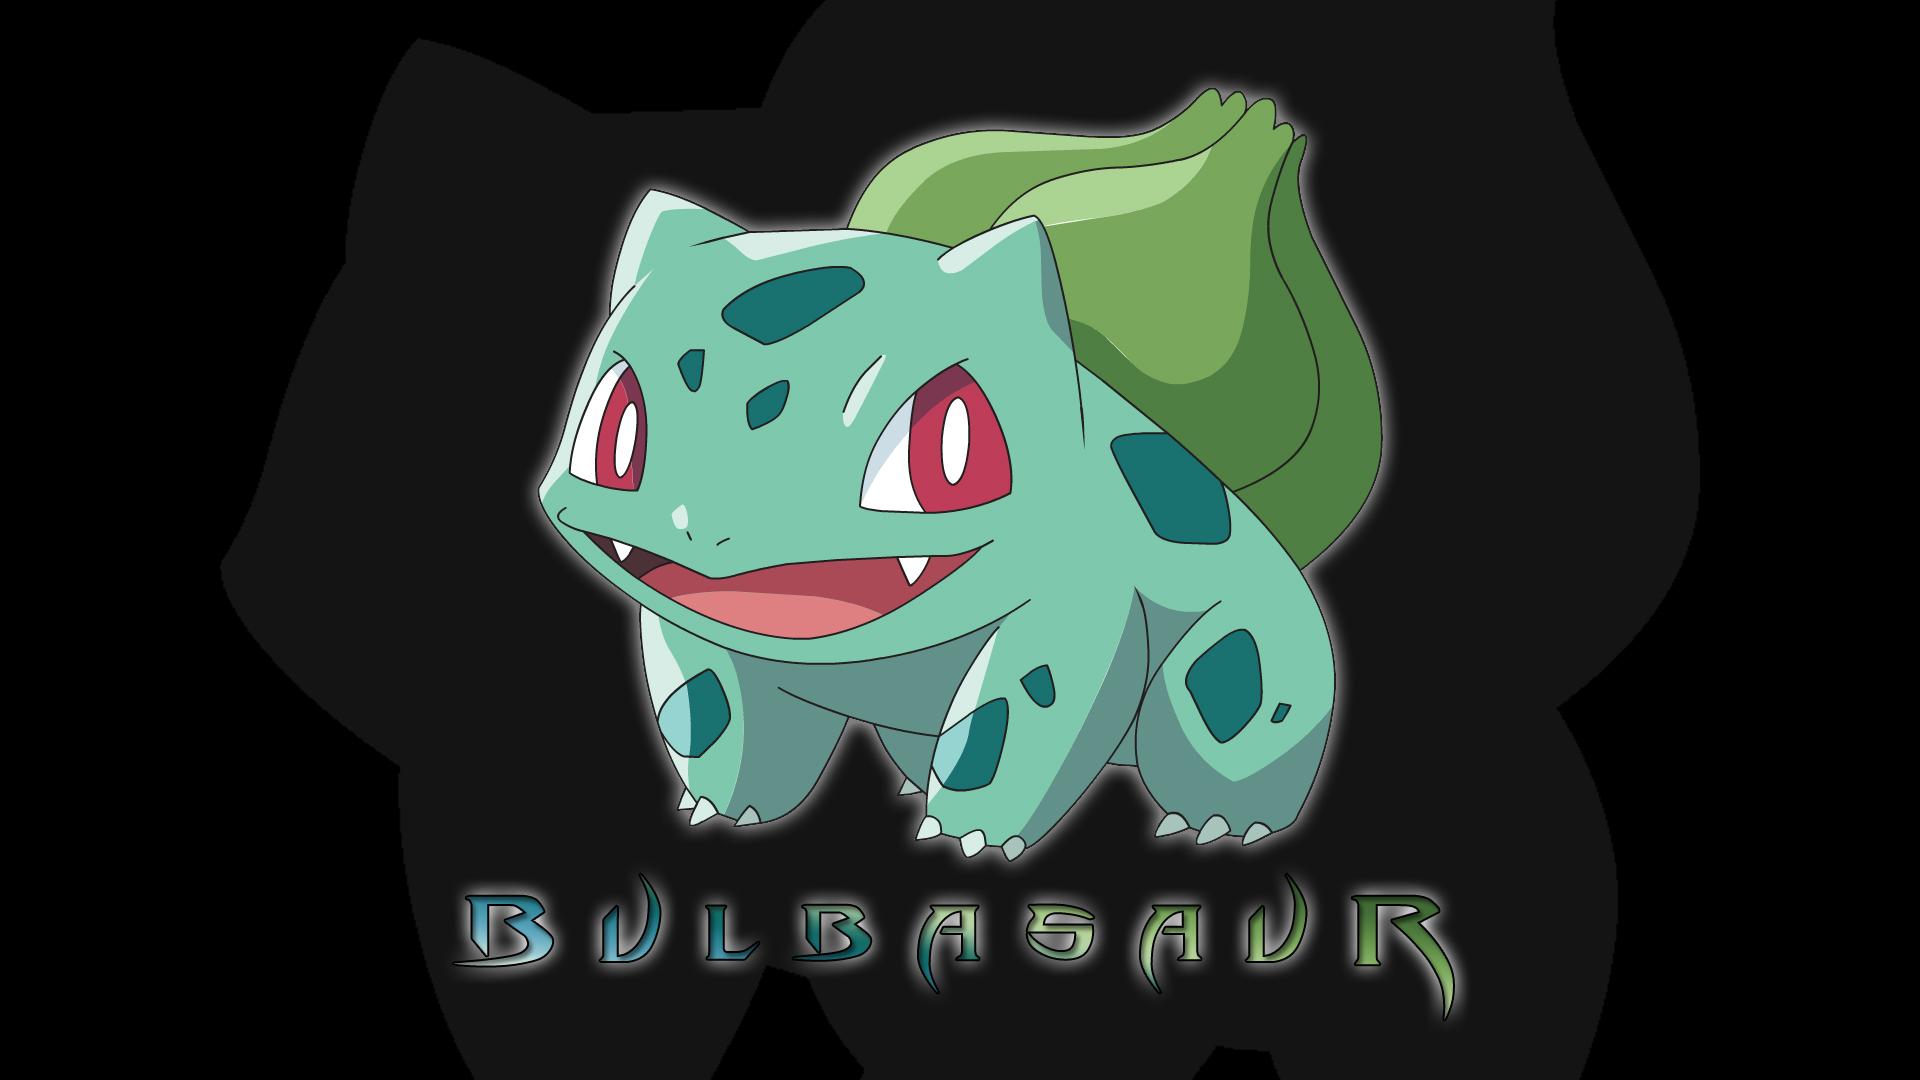 bulbasaur hd wallpaper by - photo #3